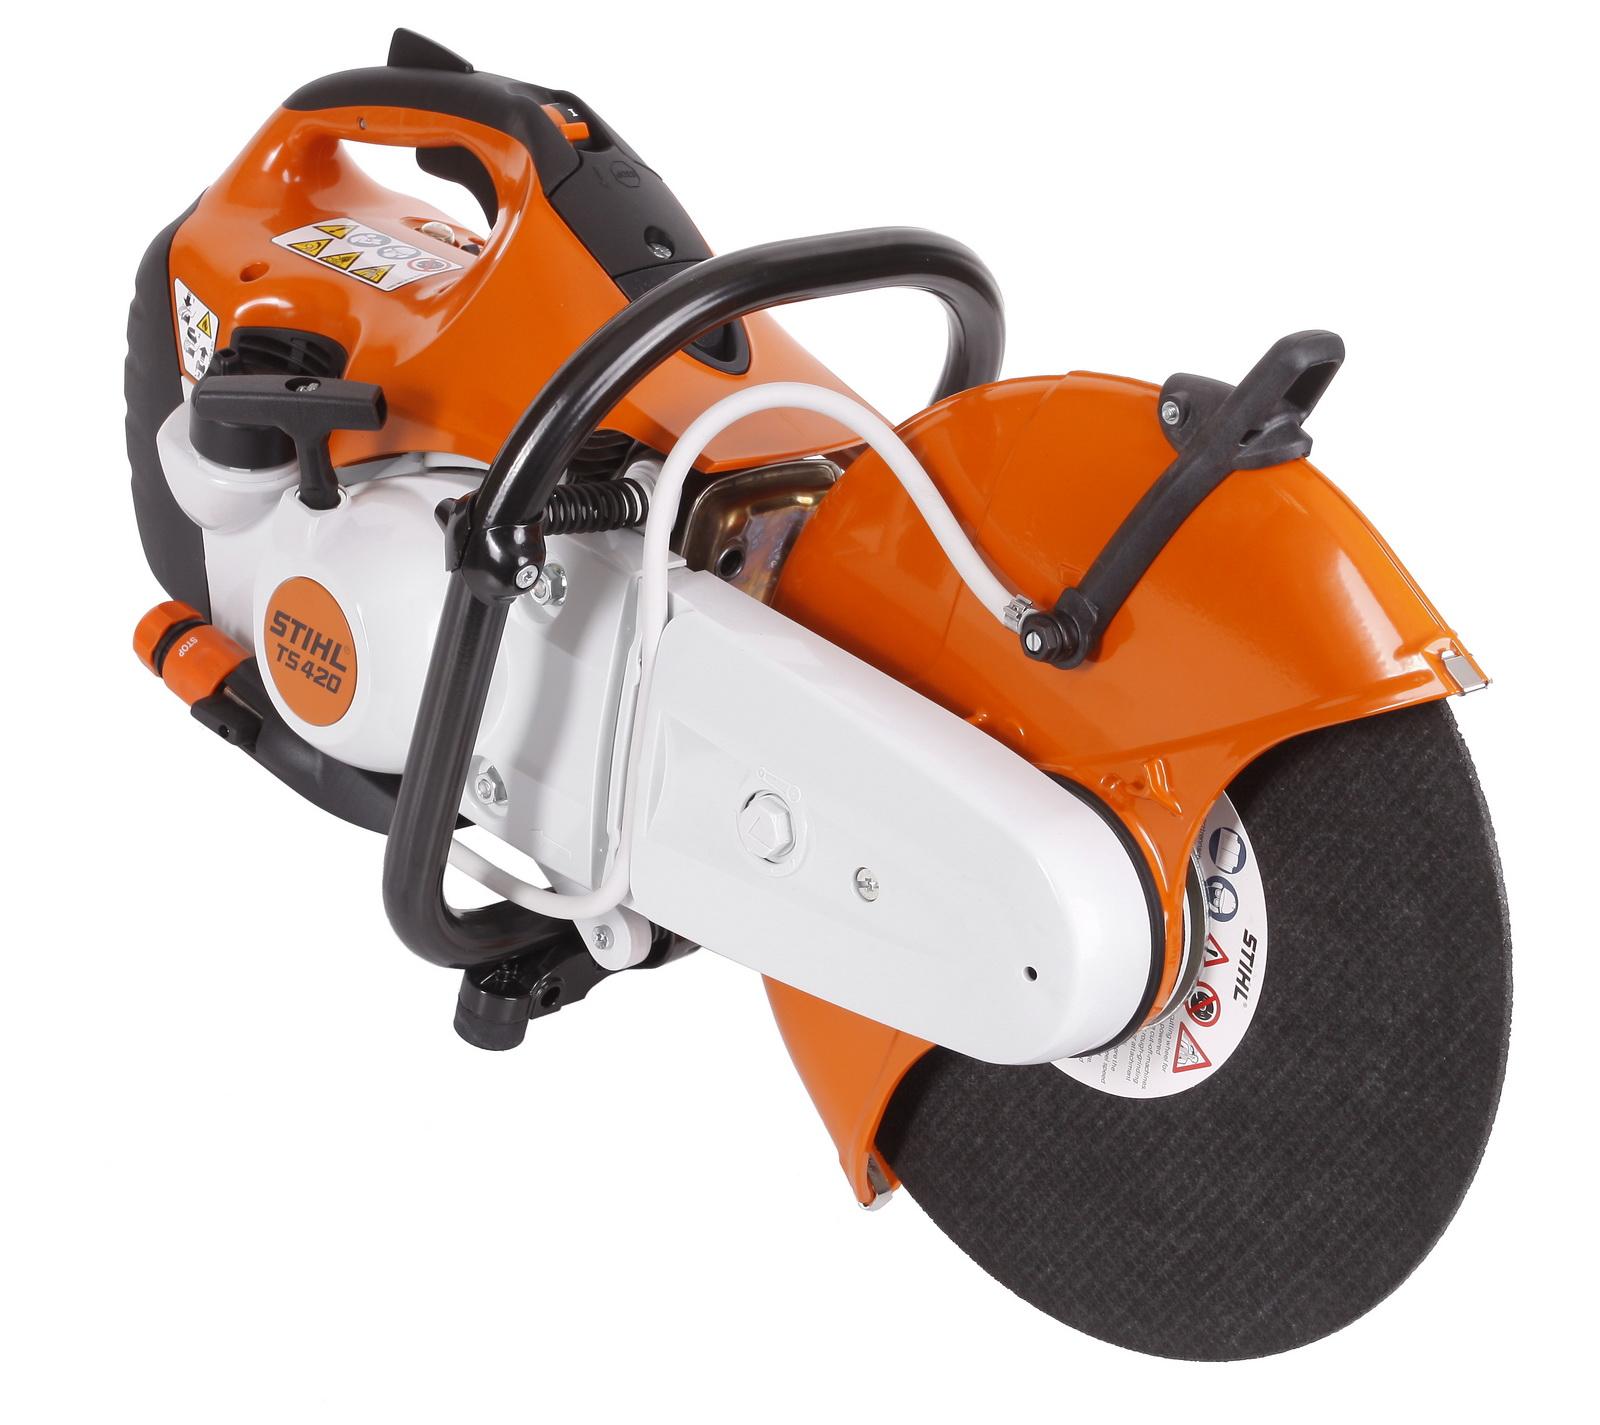 Бензорез Stihl Тs 420 oil pump w worm spur gear for stihl chainsaw 038 042 048 ms380 ms381 gasoline chain saw repl stihl p n 1119 640 3200